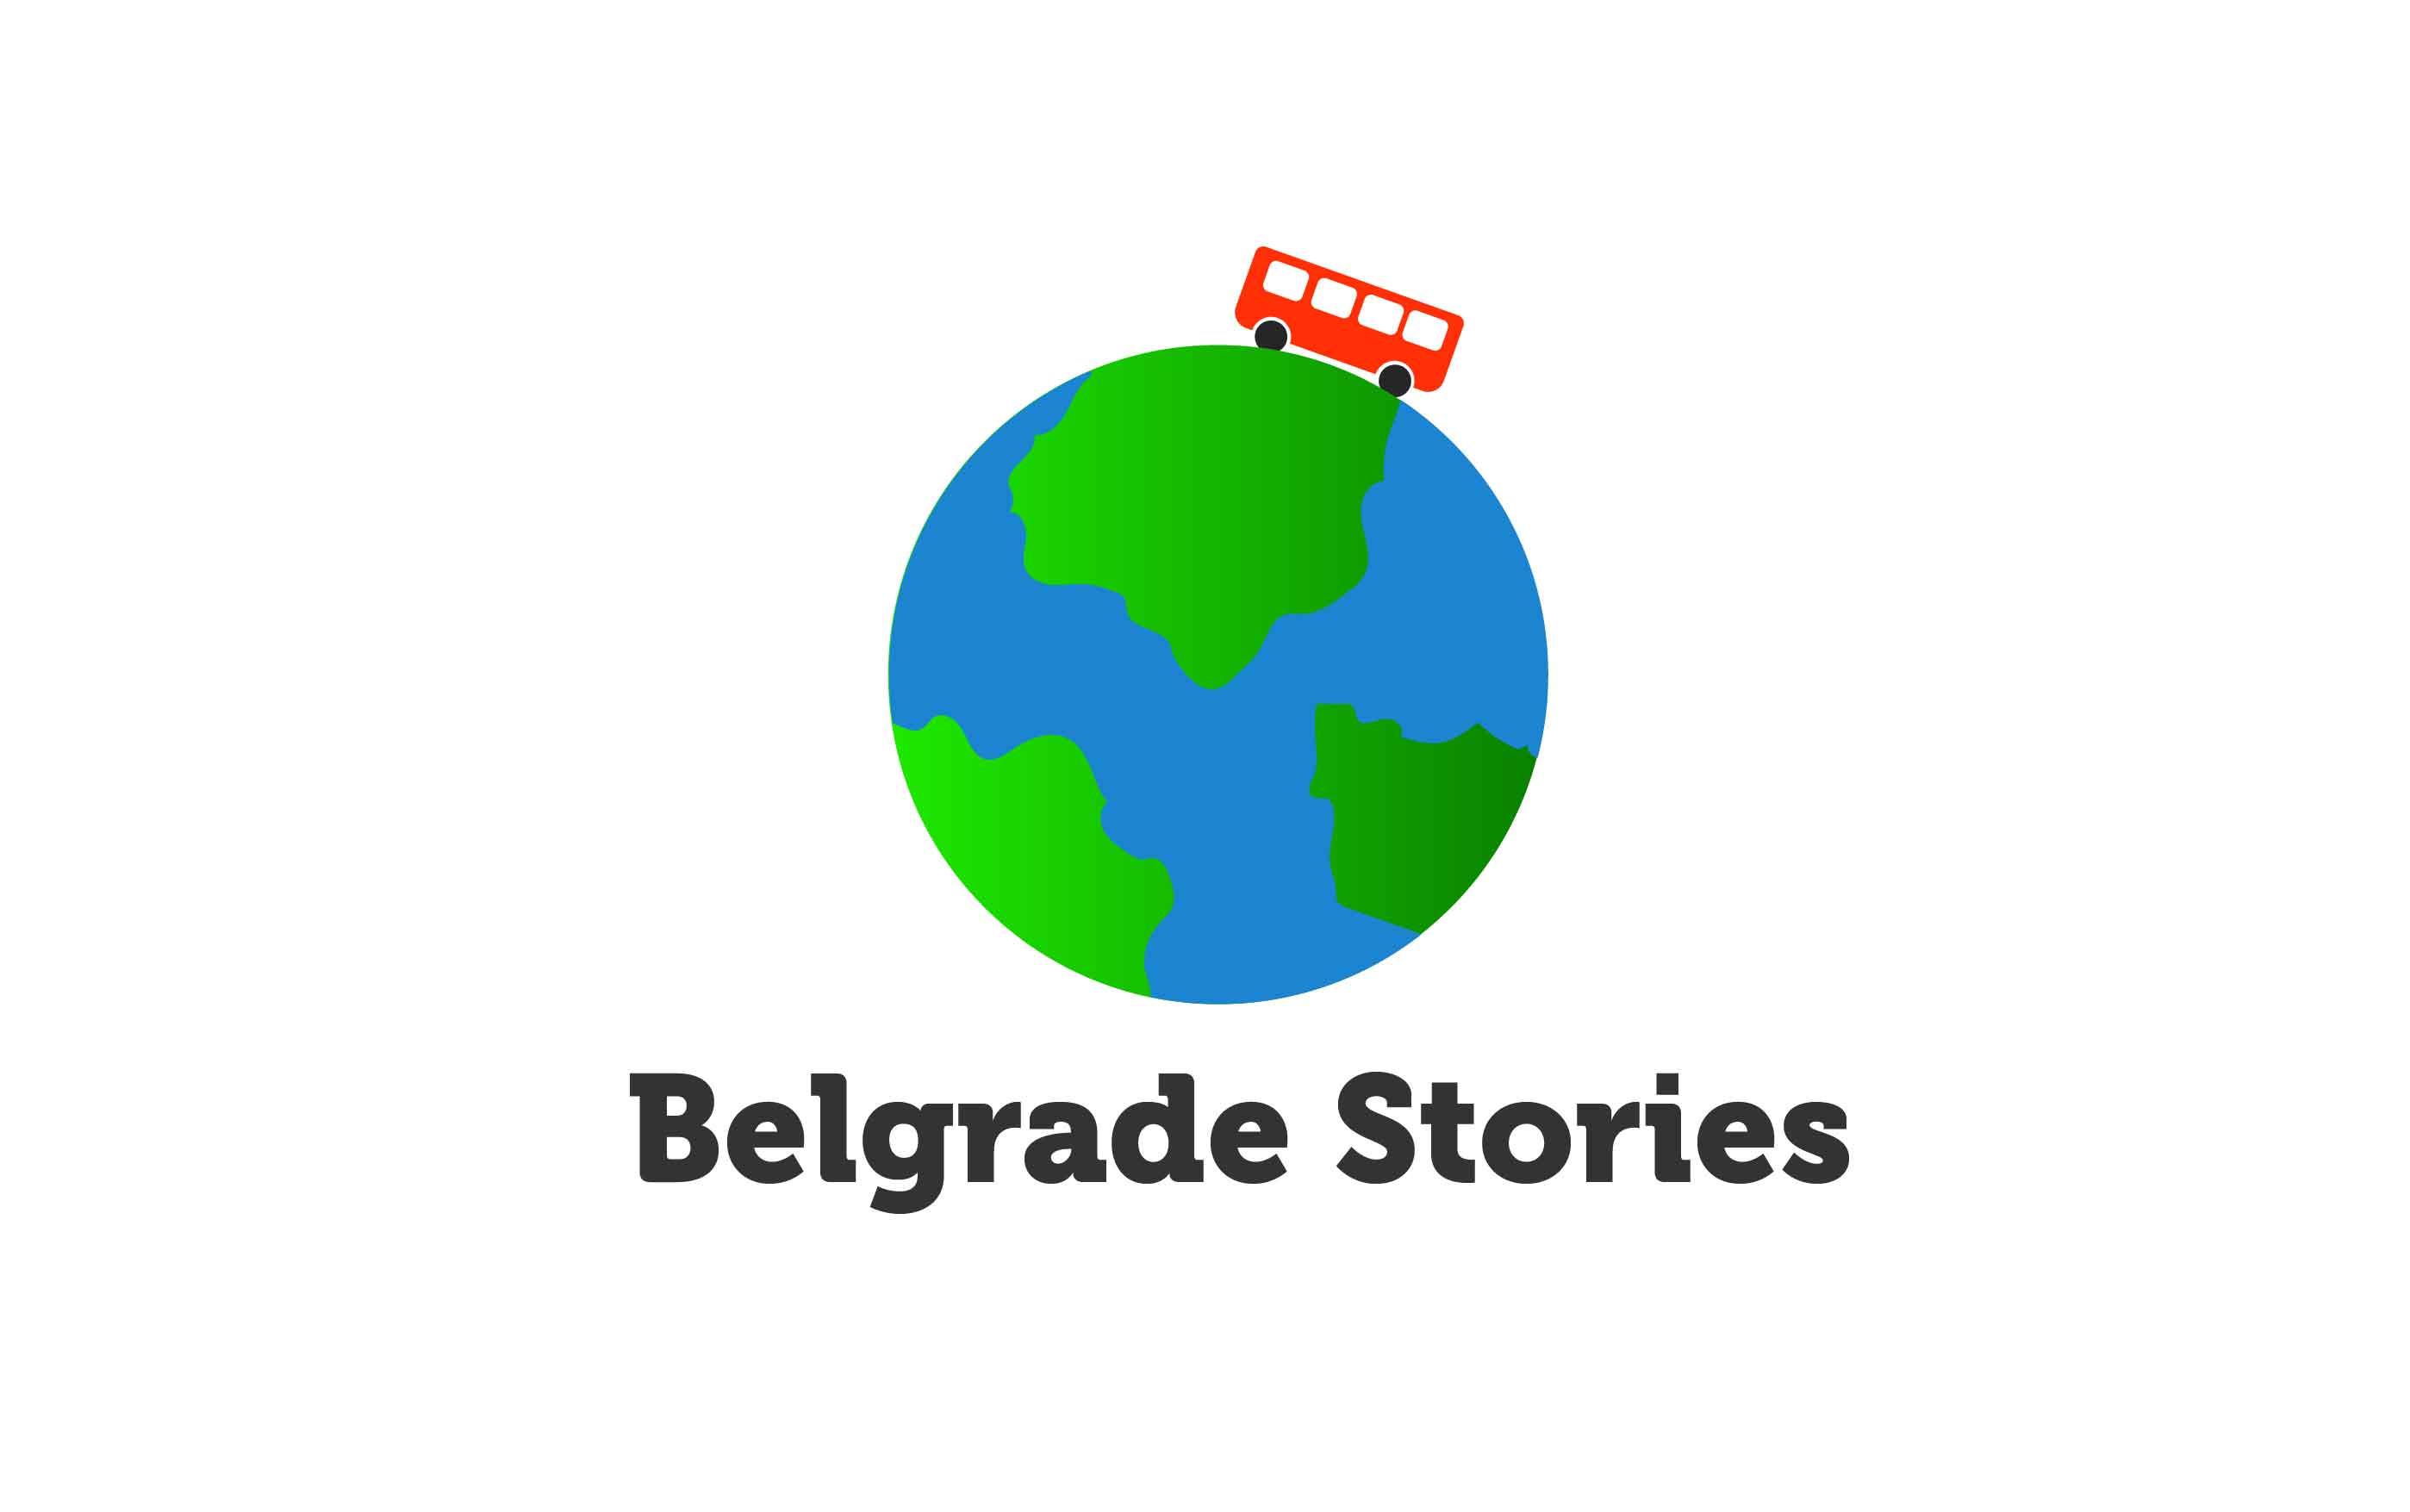 Логотип для агентства городских туров в Белграде фото f_500589b1ca09154e.jpg